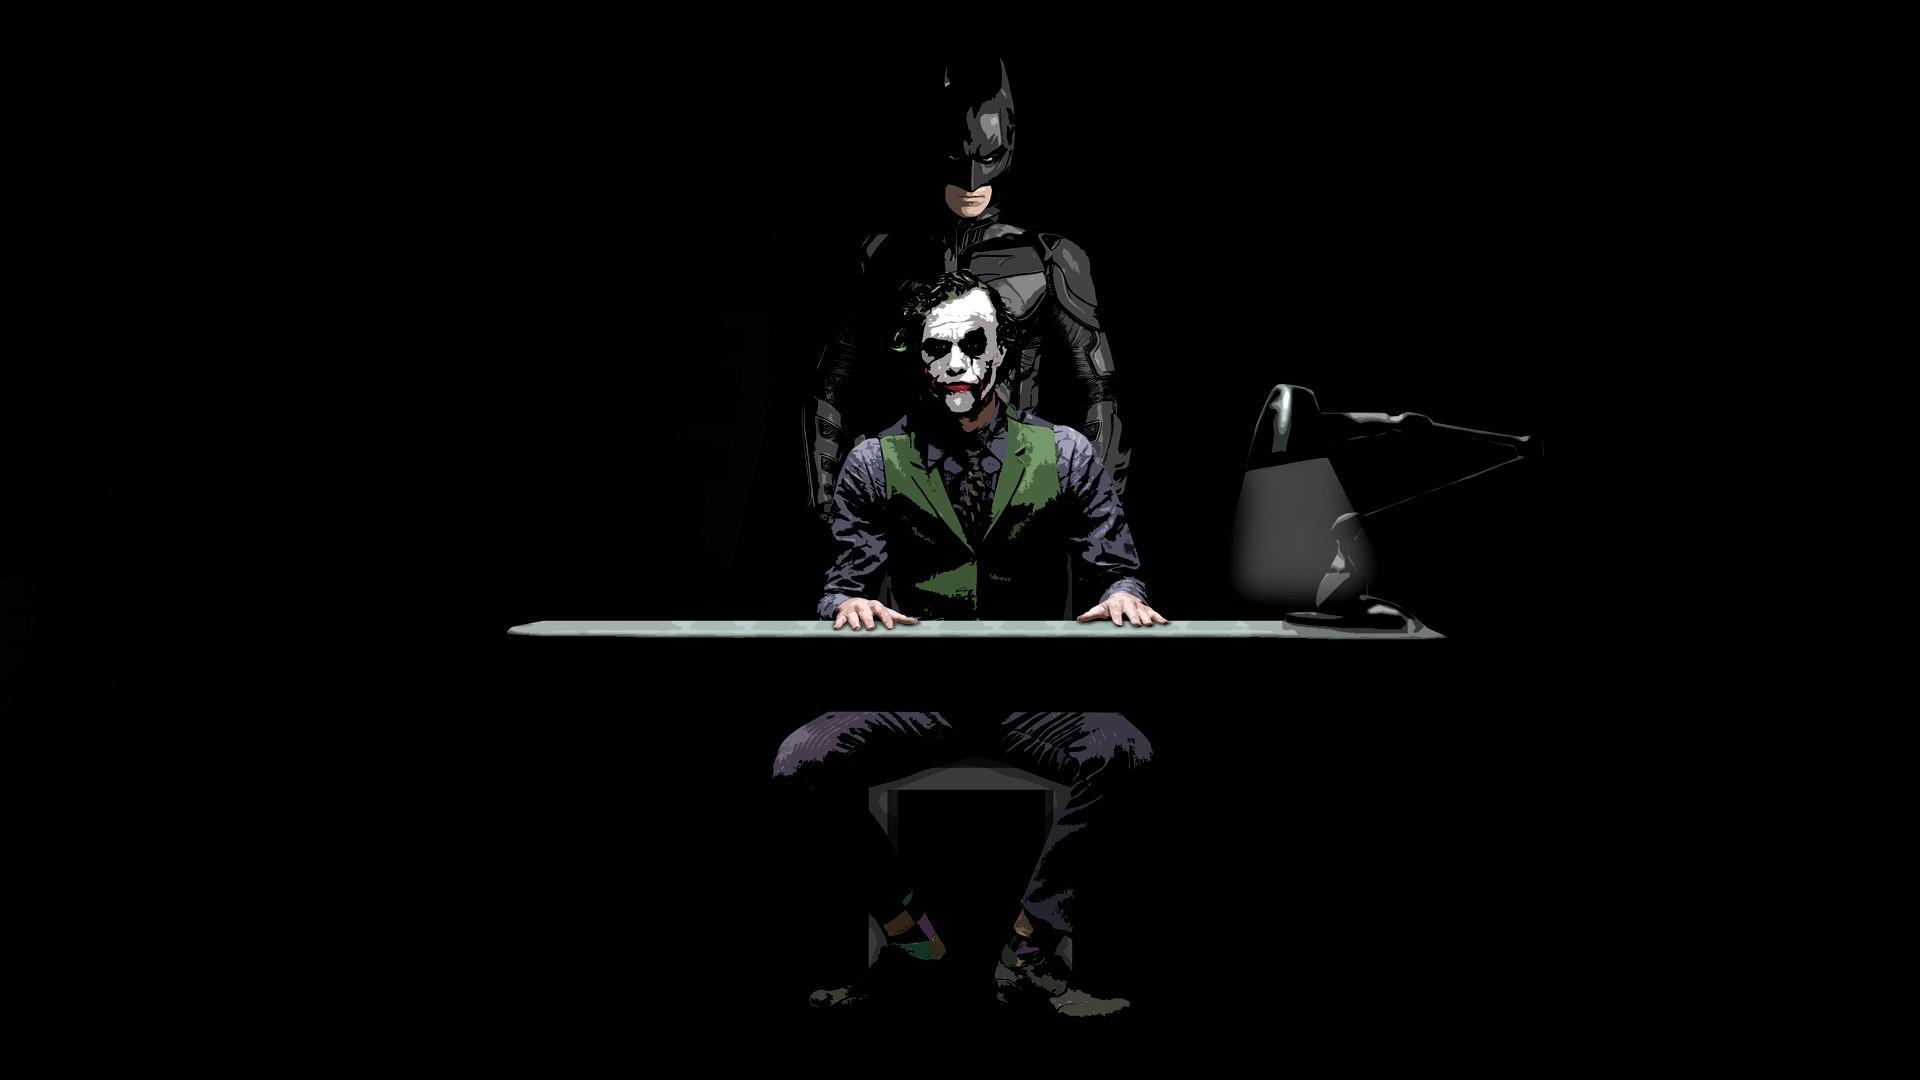 wallpaper : 1920x1080 px, batman, joker, messenjahmatt, movies, the